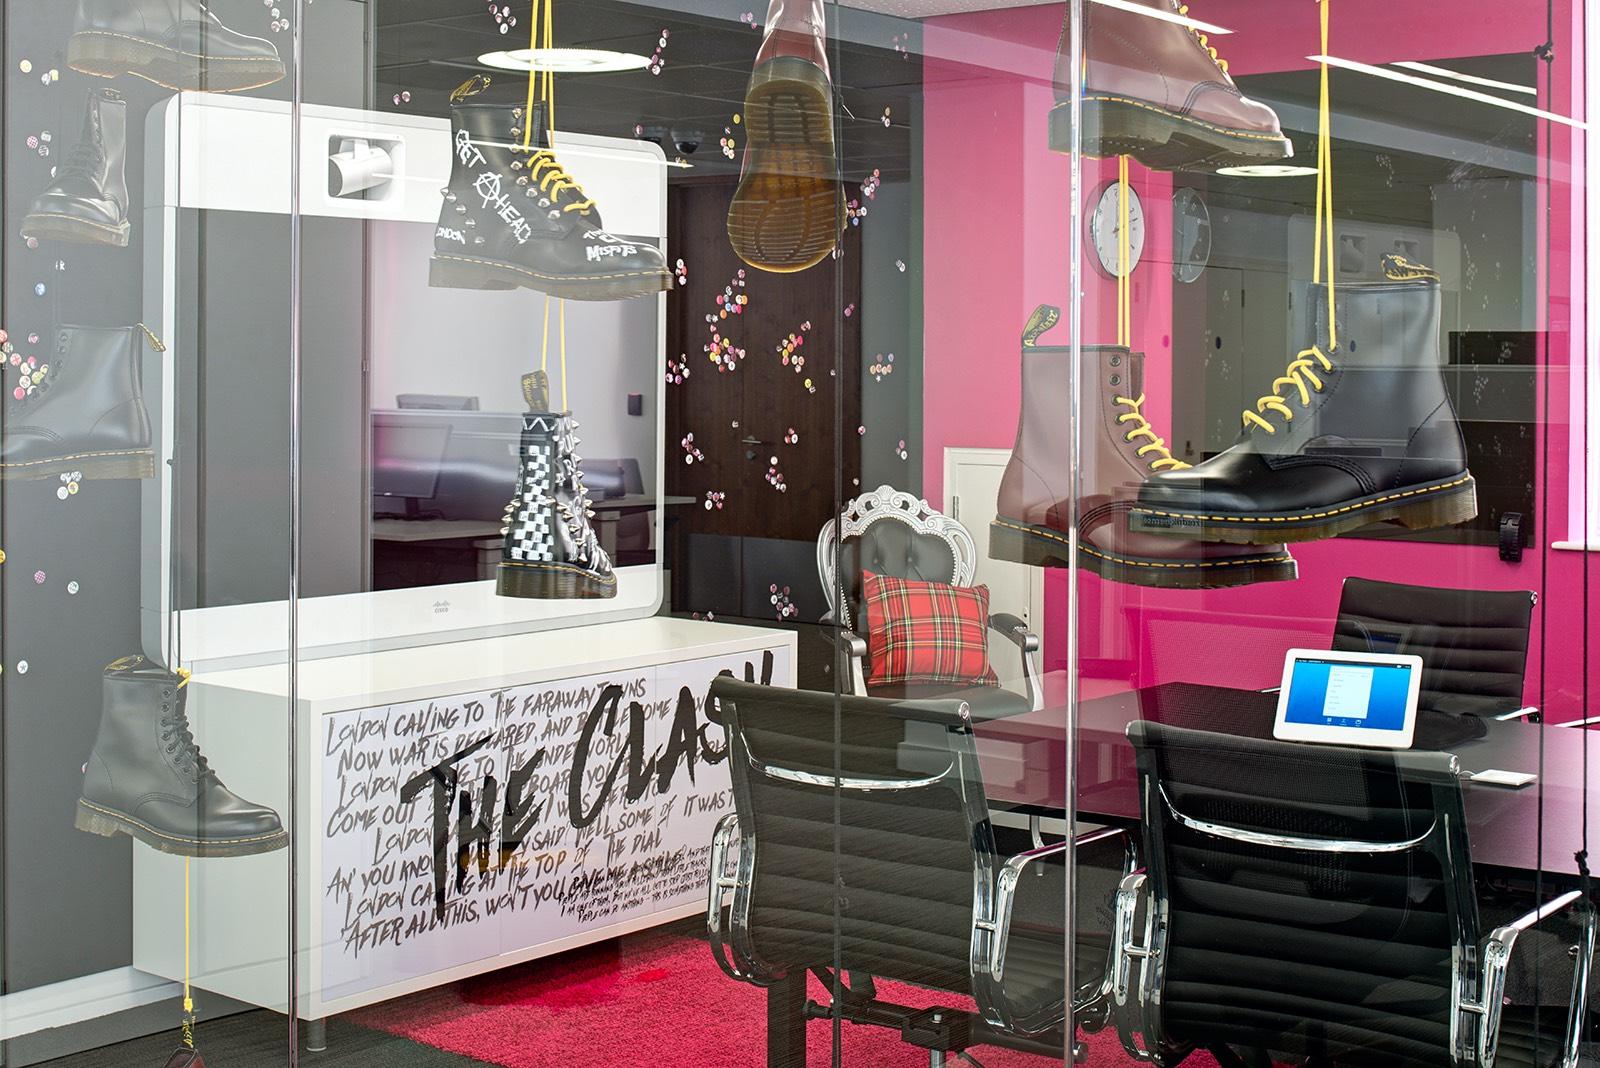 linkedin-office-london-6